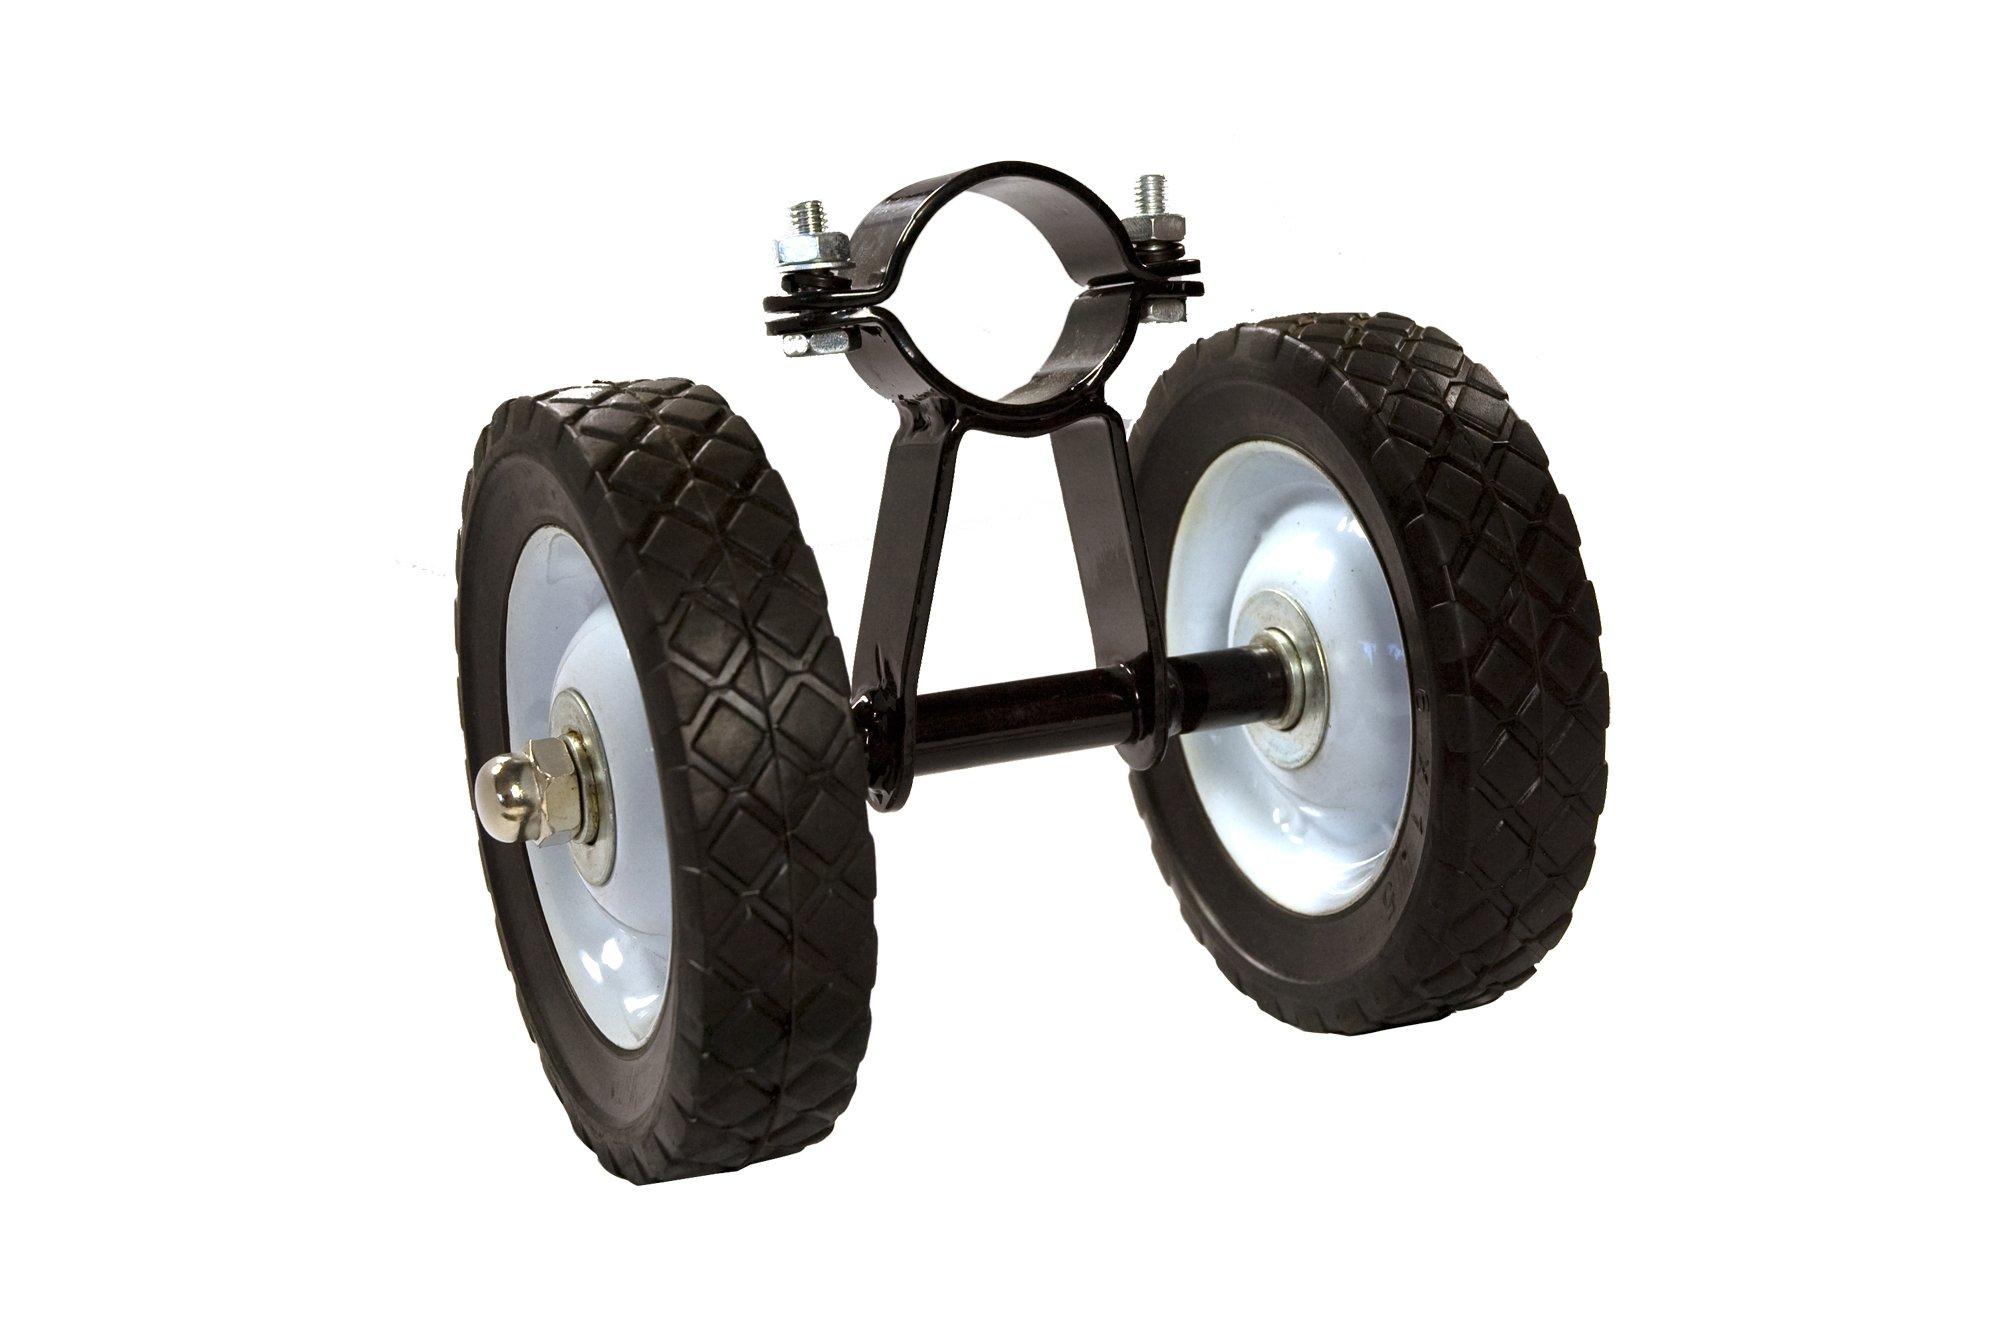 Bliss Hammocks Wheel Kit for 15' Hammock Stand, Black